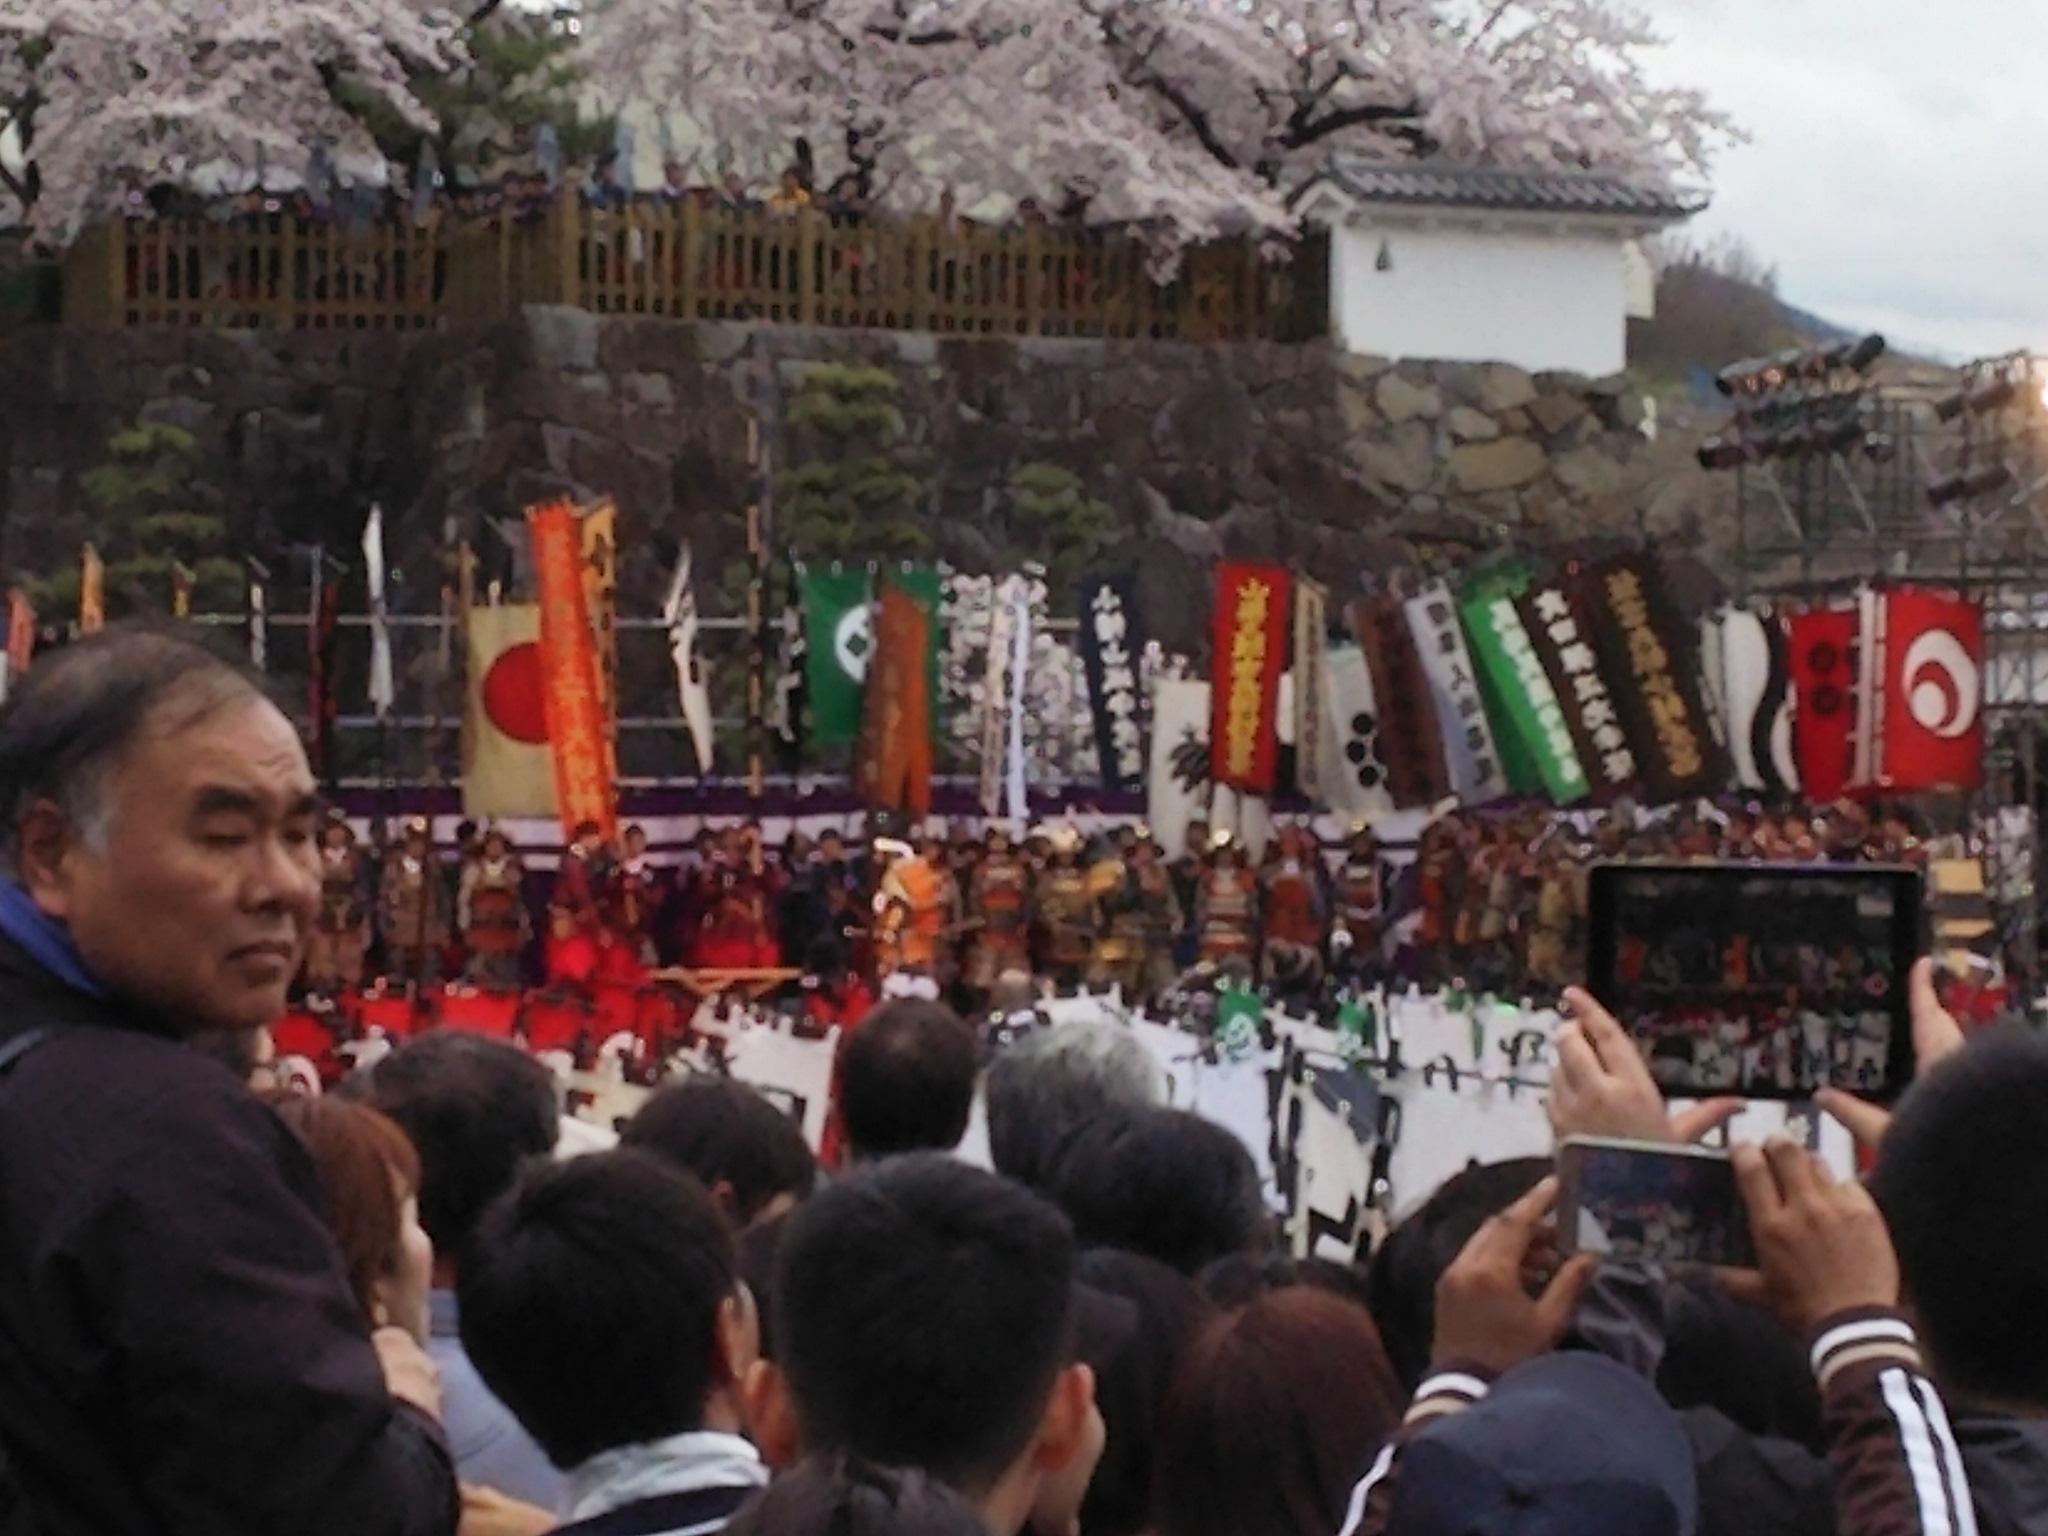 http://www.yamanashi-kankou.jp/blog/DSC_0028.JPG